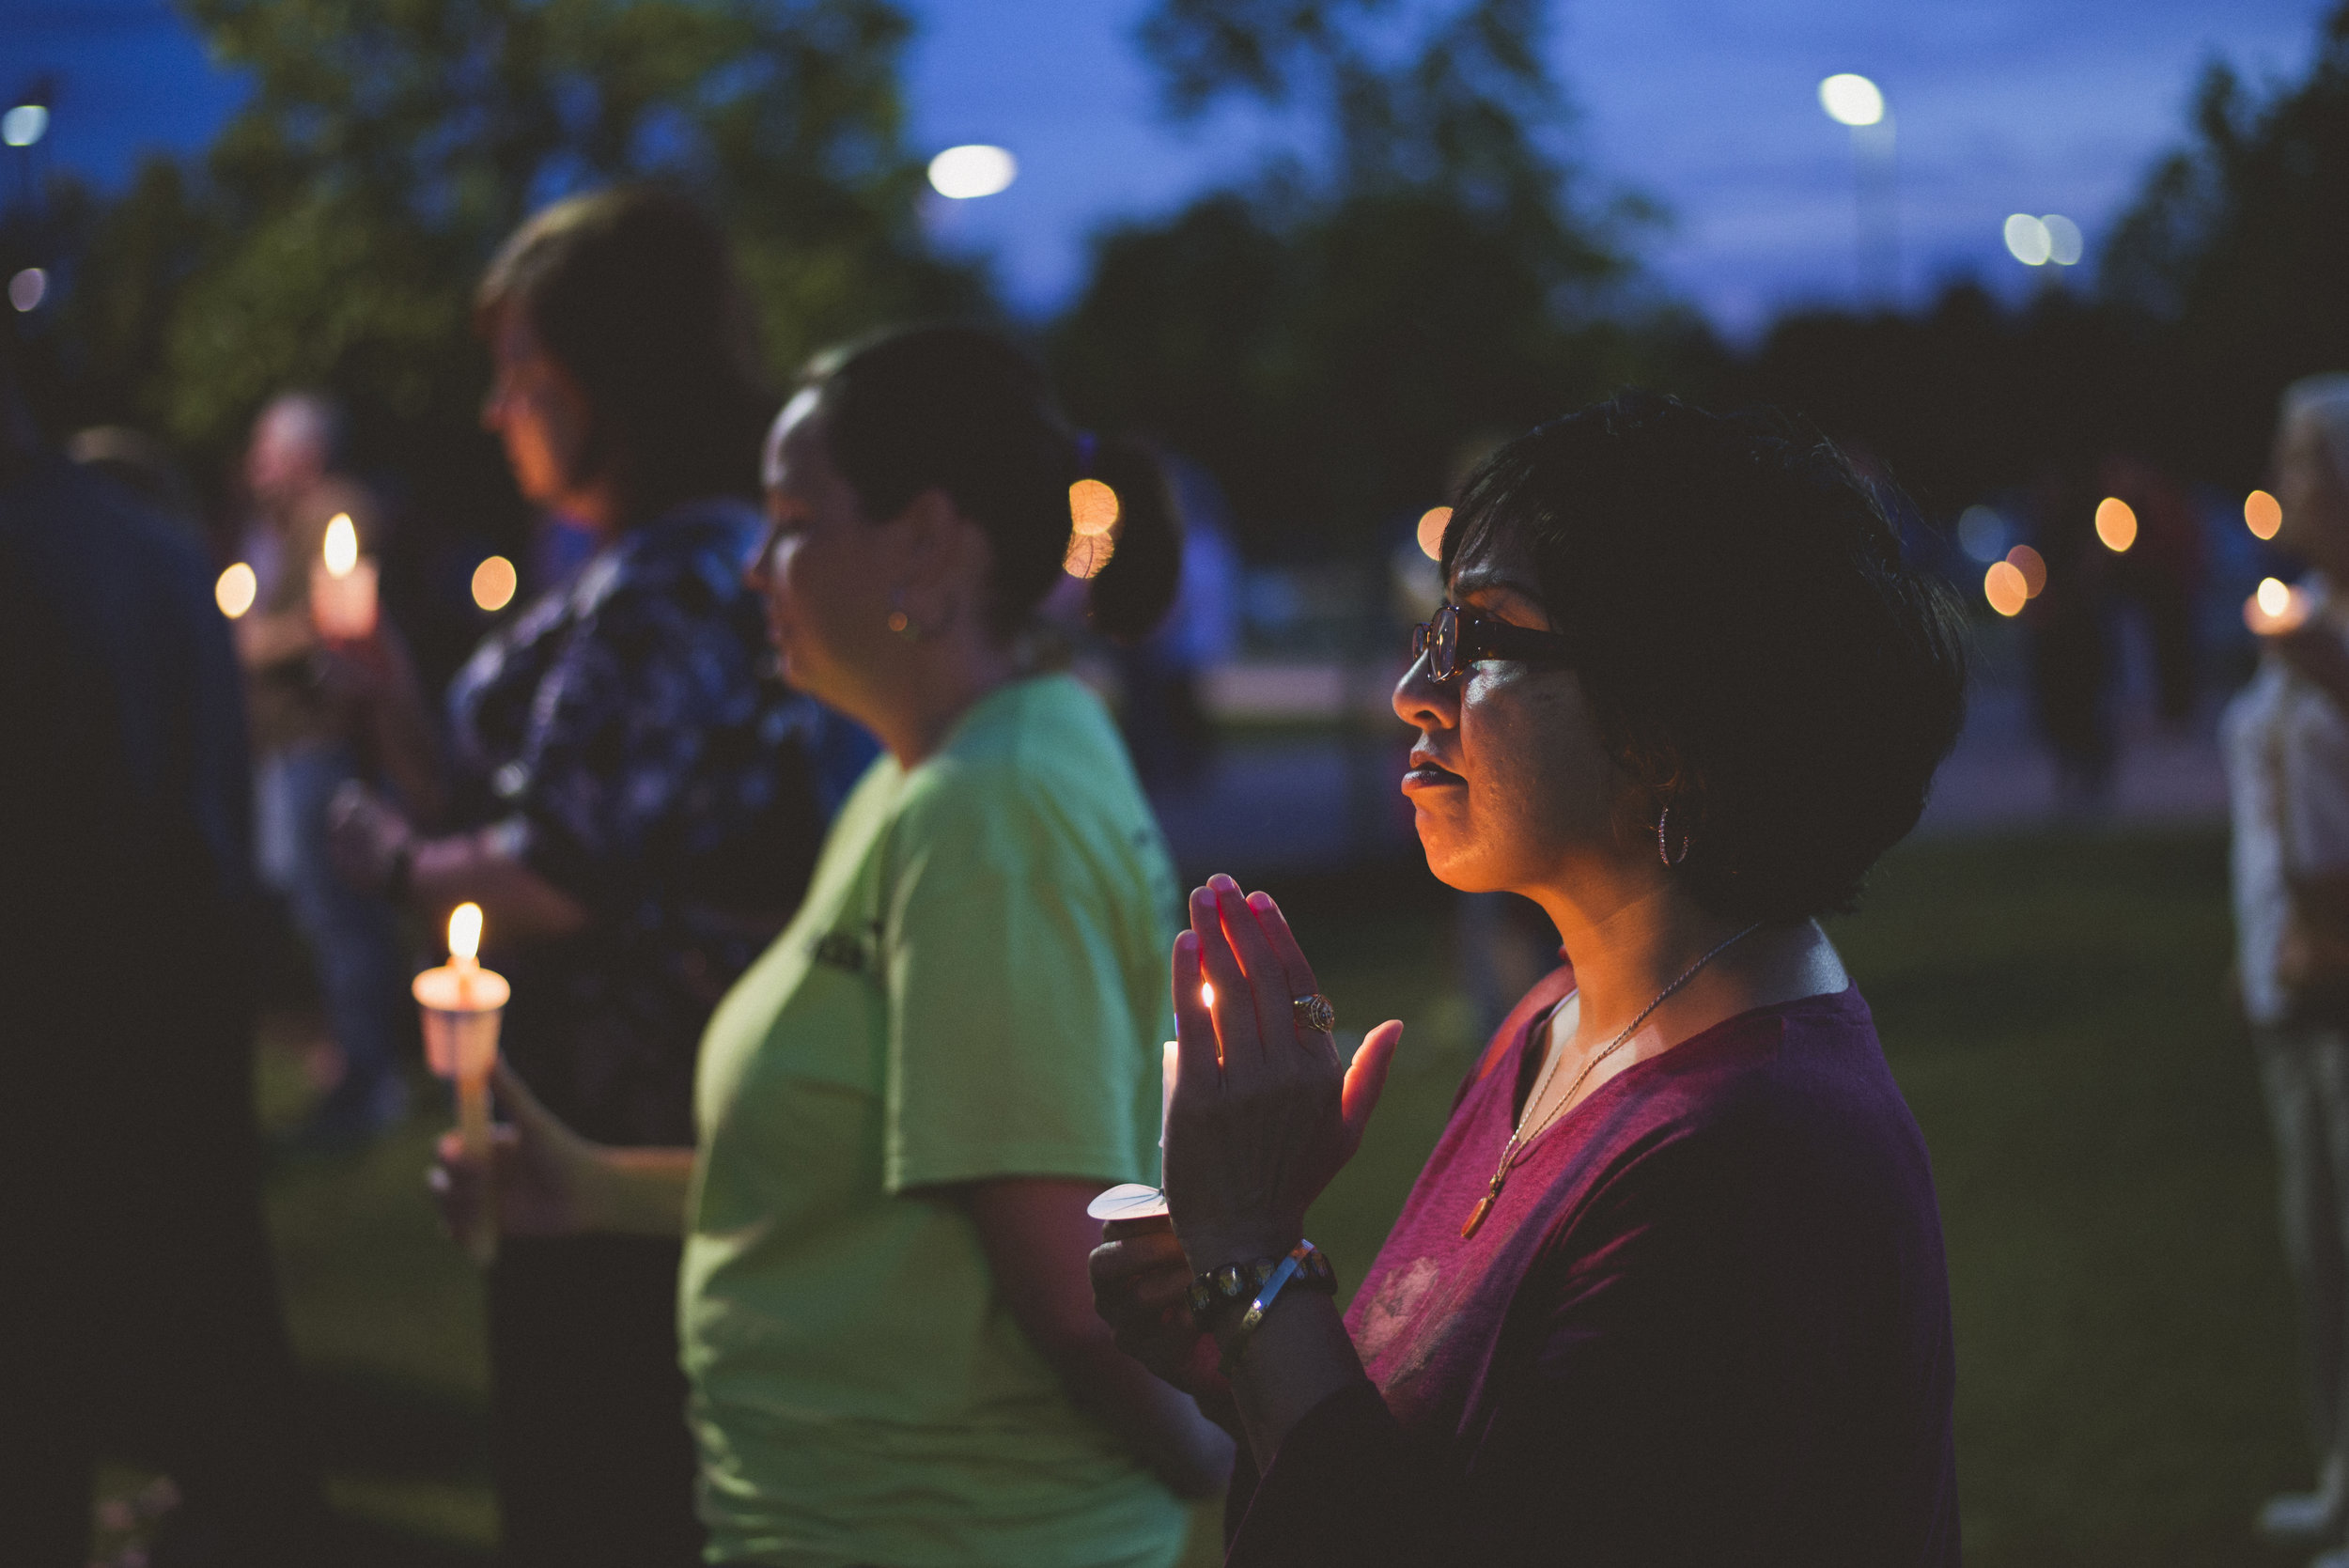 Candlelight Vigil for Matthew Gerald_Allie Appel_13.jpg